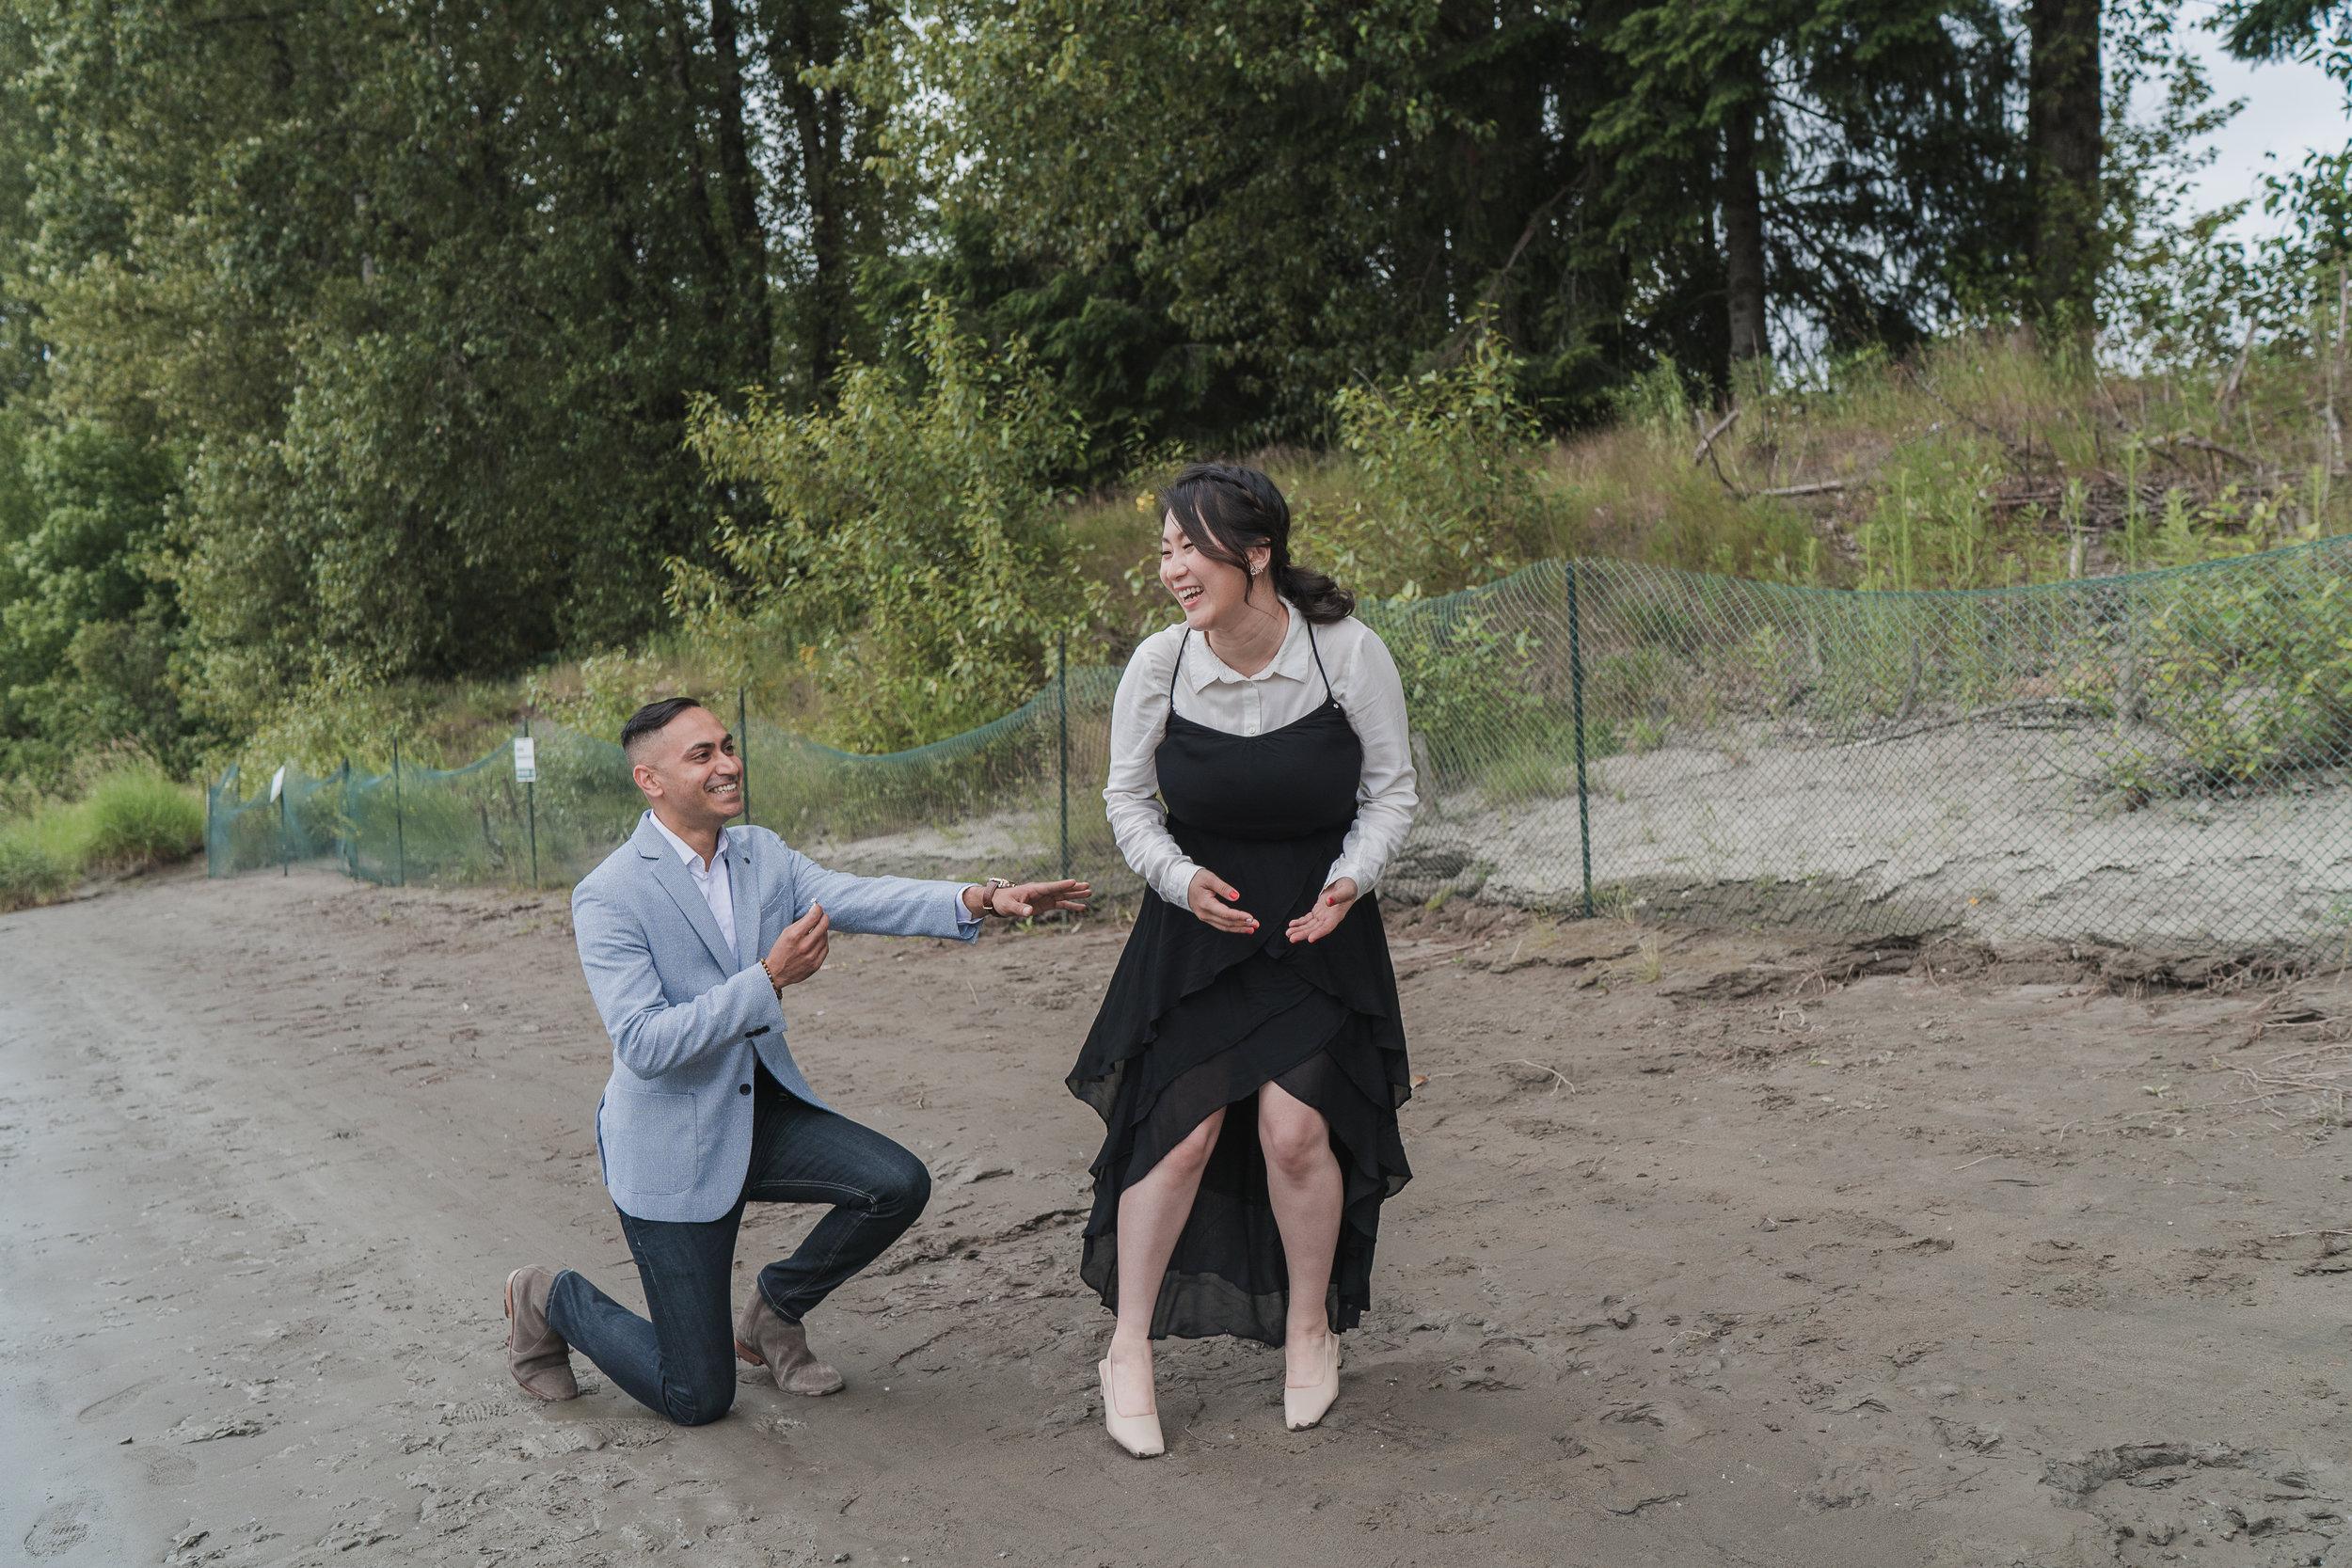 20190622 - Monika & Johnson Engagement- 0028.jpg